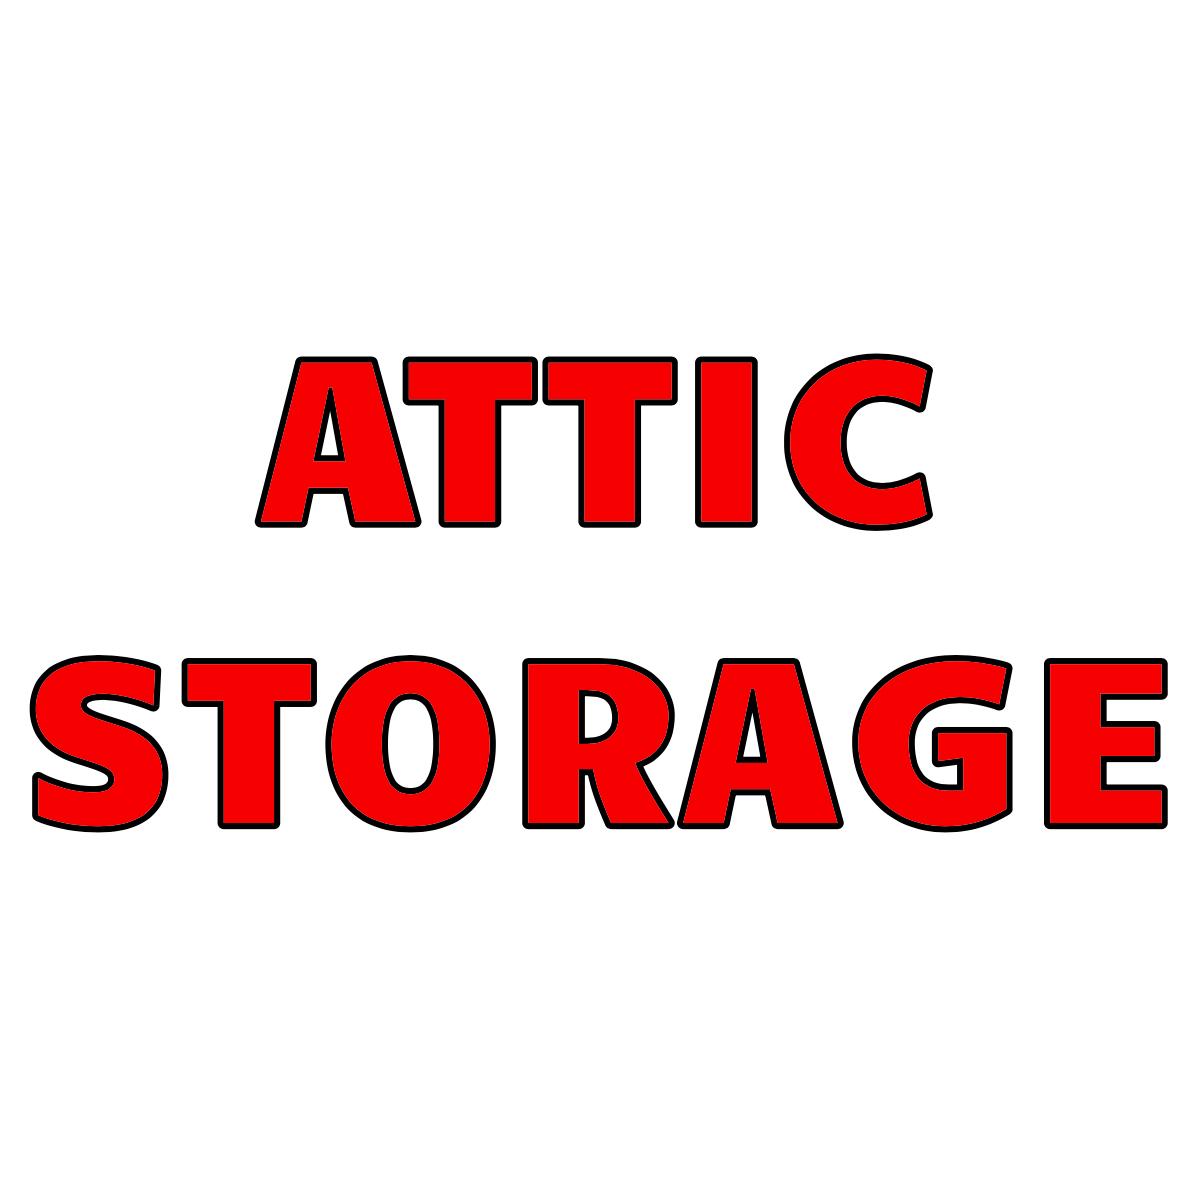 attic storage in fredricksburg, tx